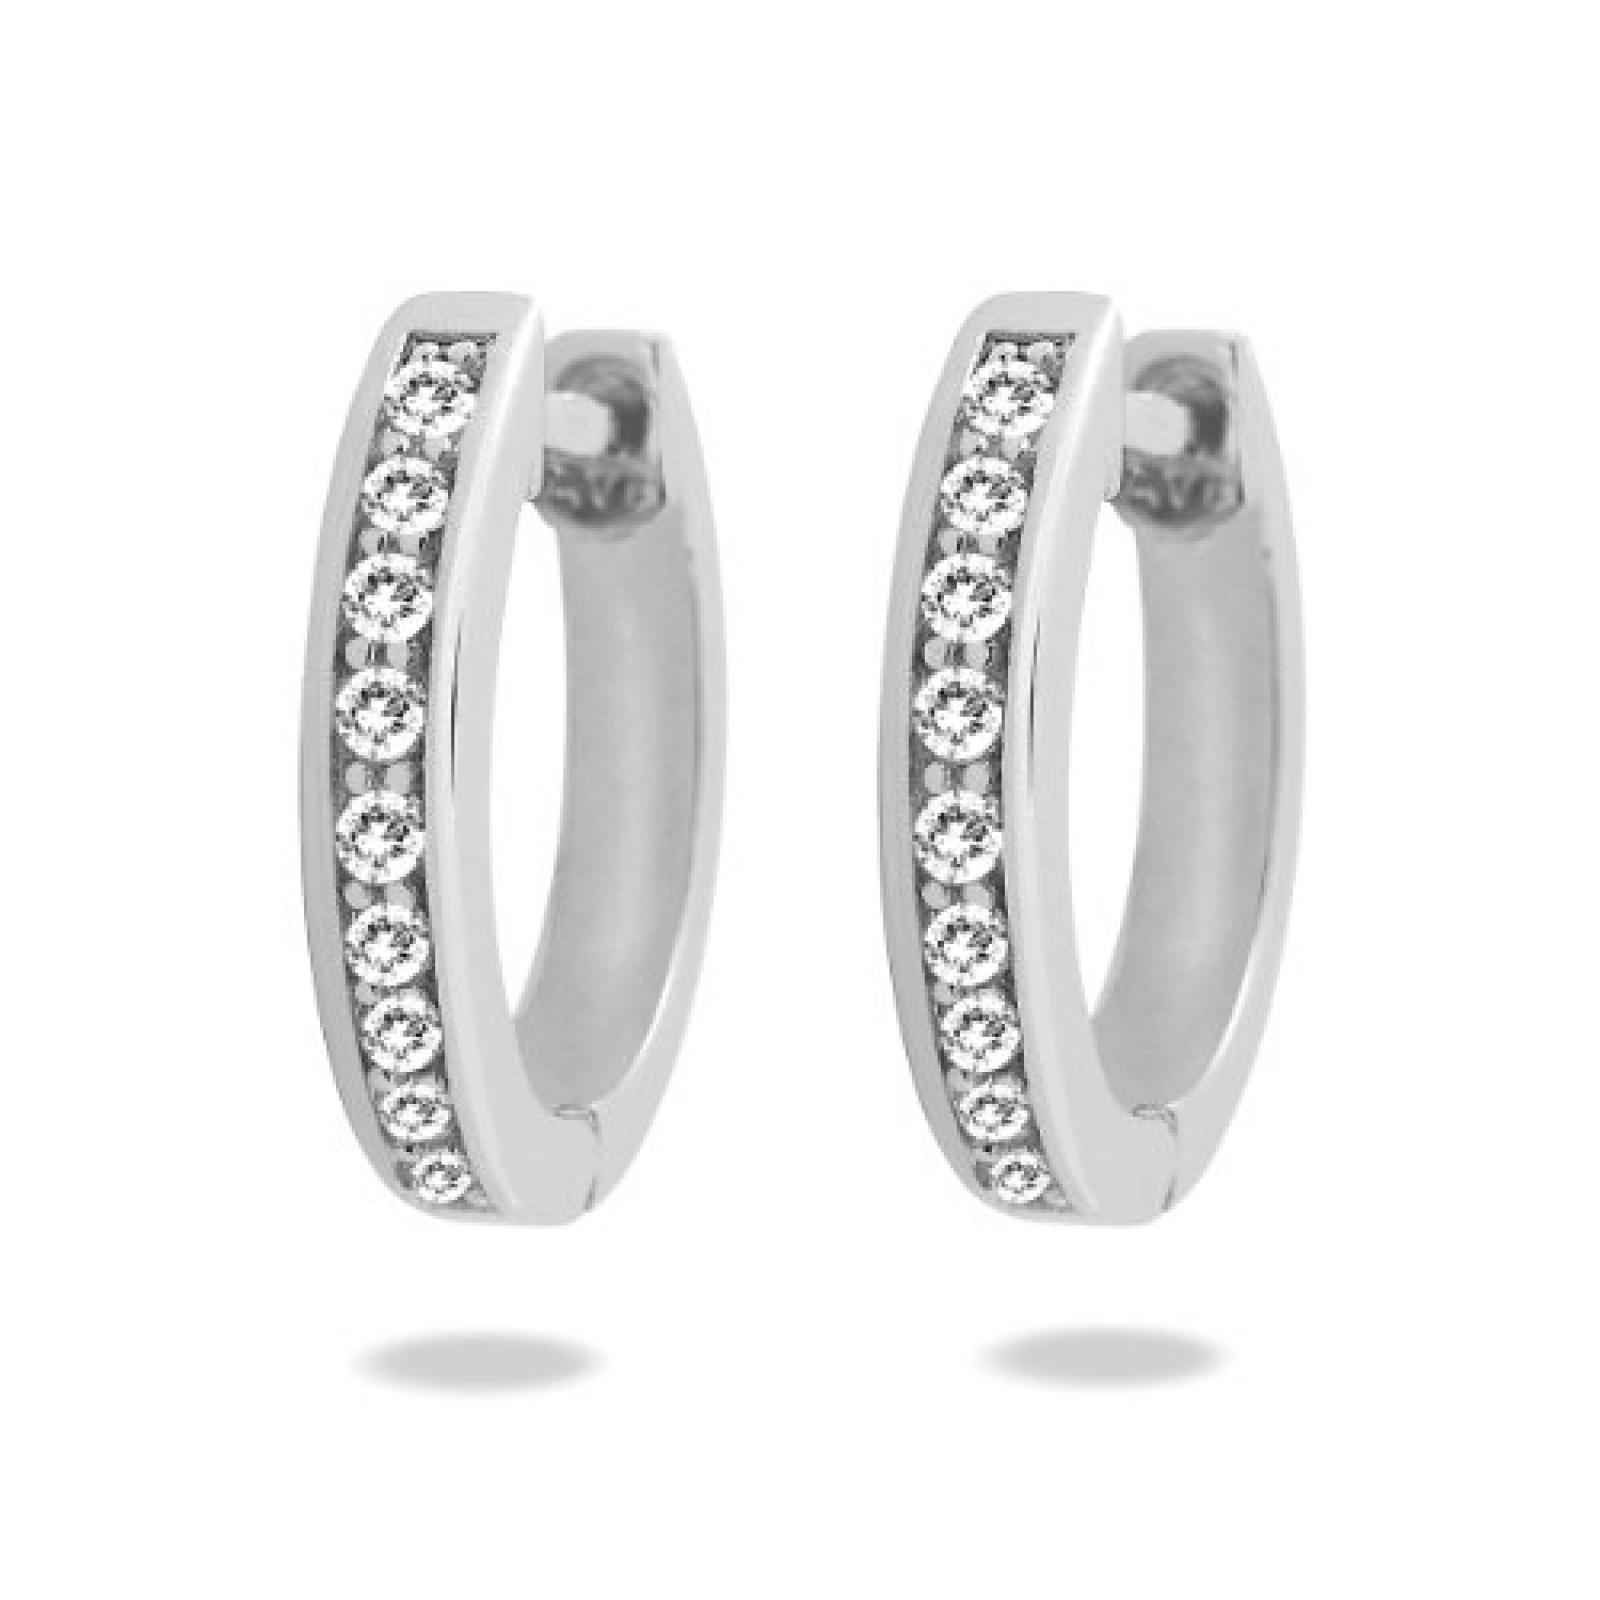 Rafaela Donata Damen-Creolen Classic Collection Zirkonia weiß 925 Sterling Silber 60837065